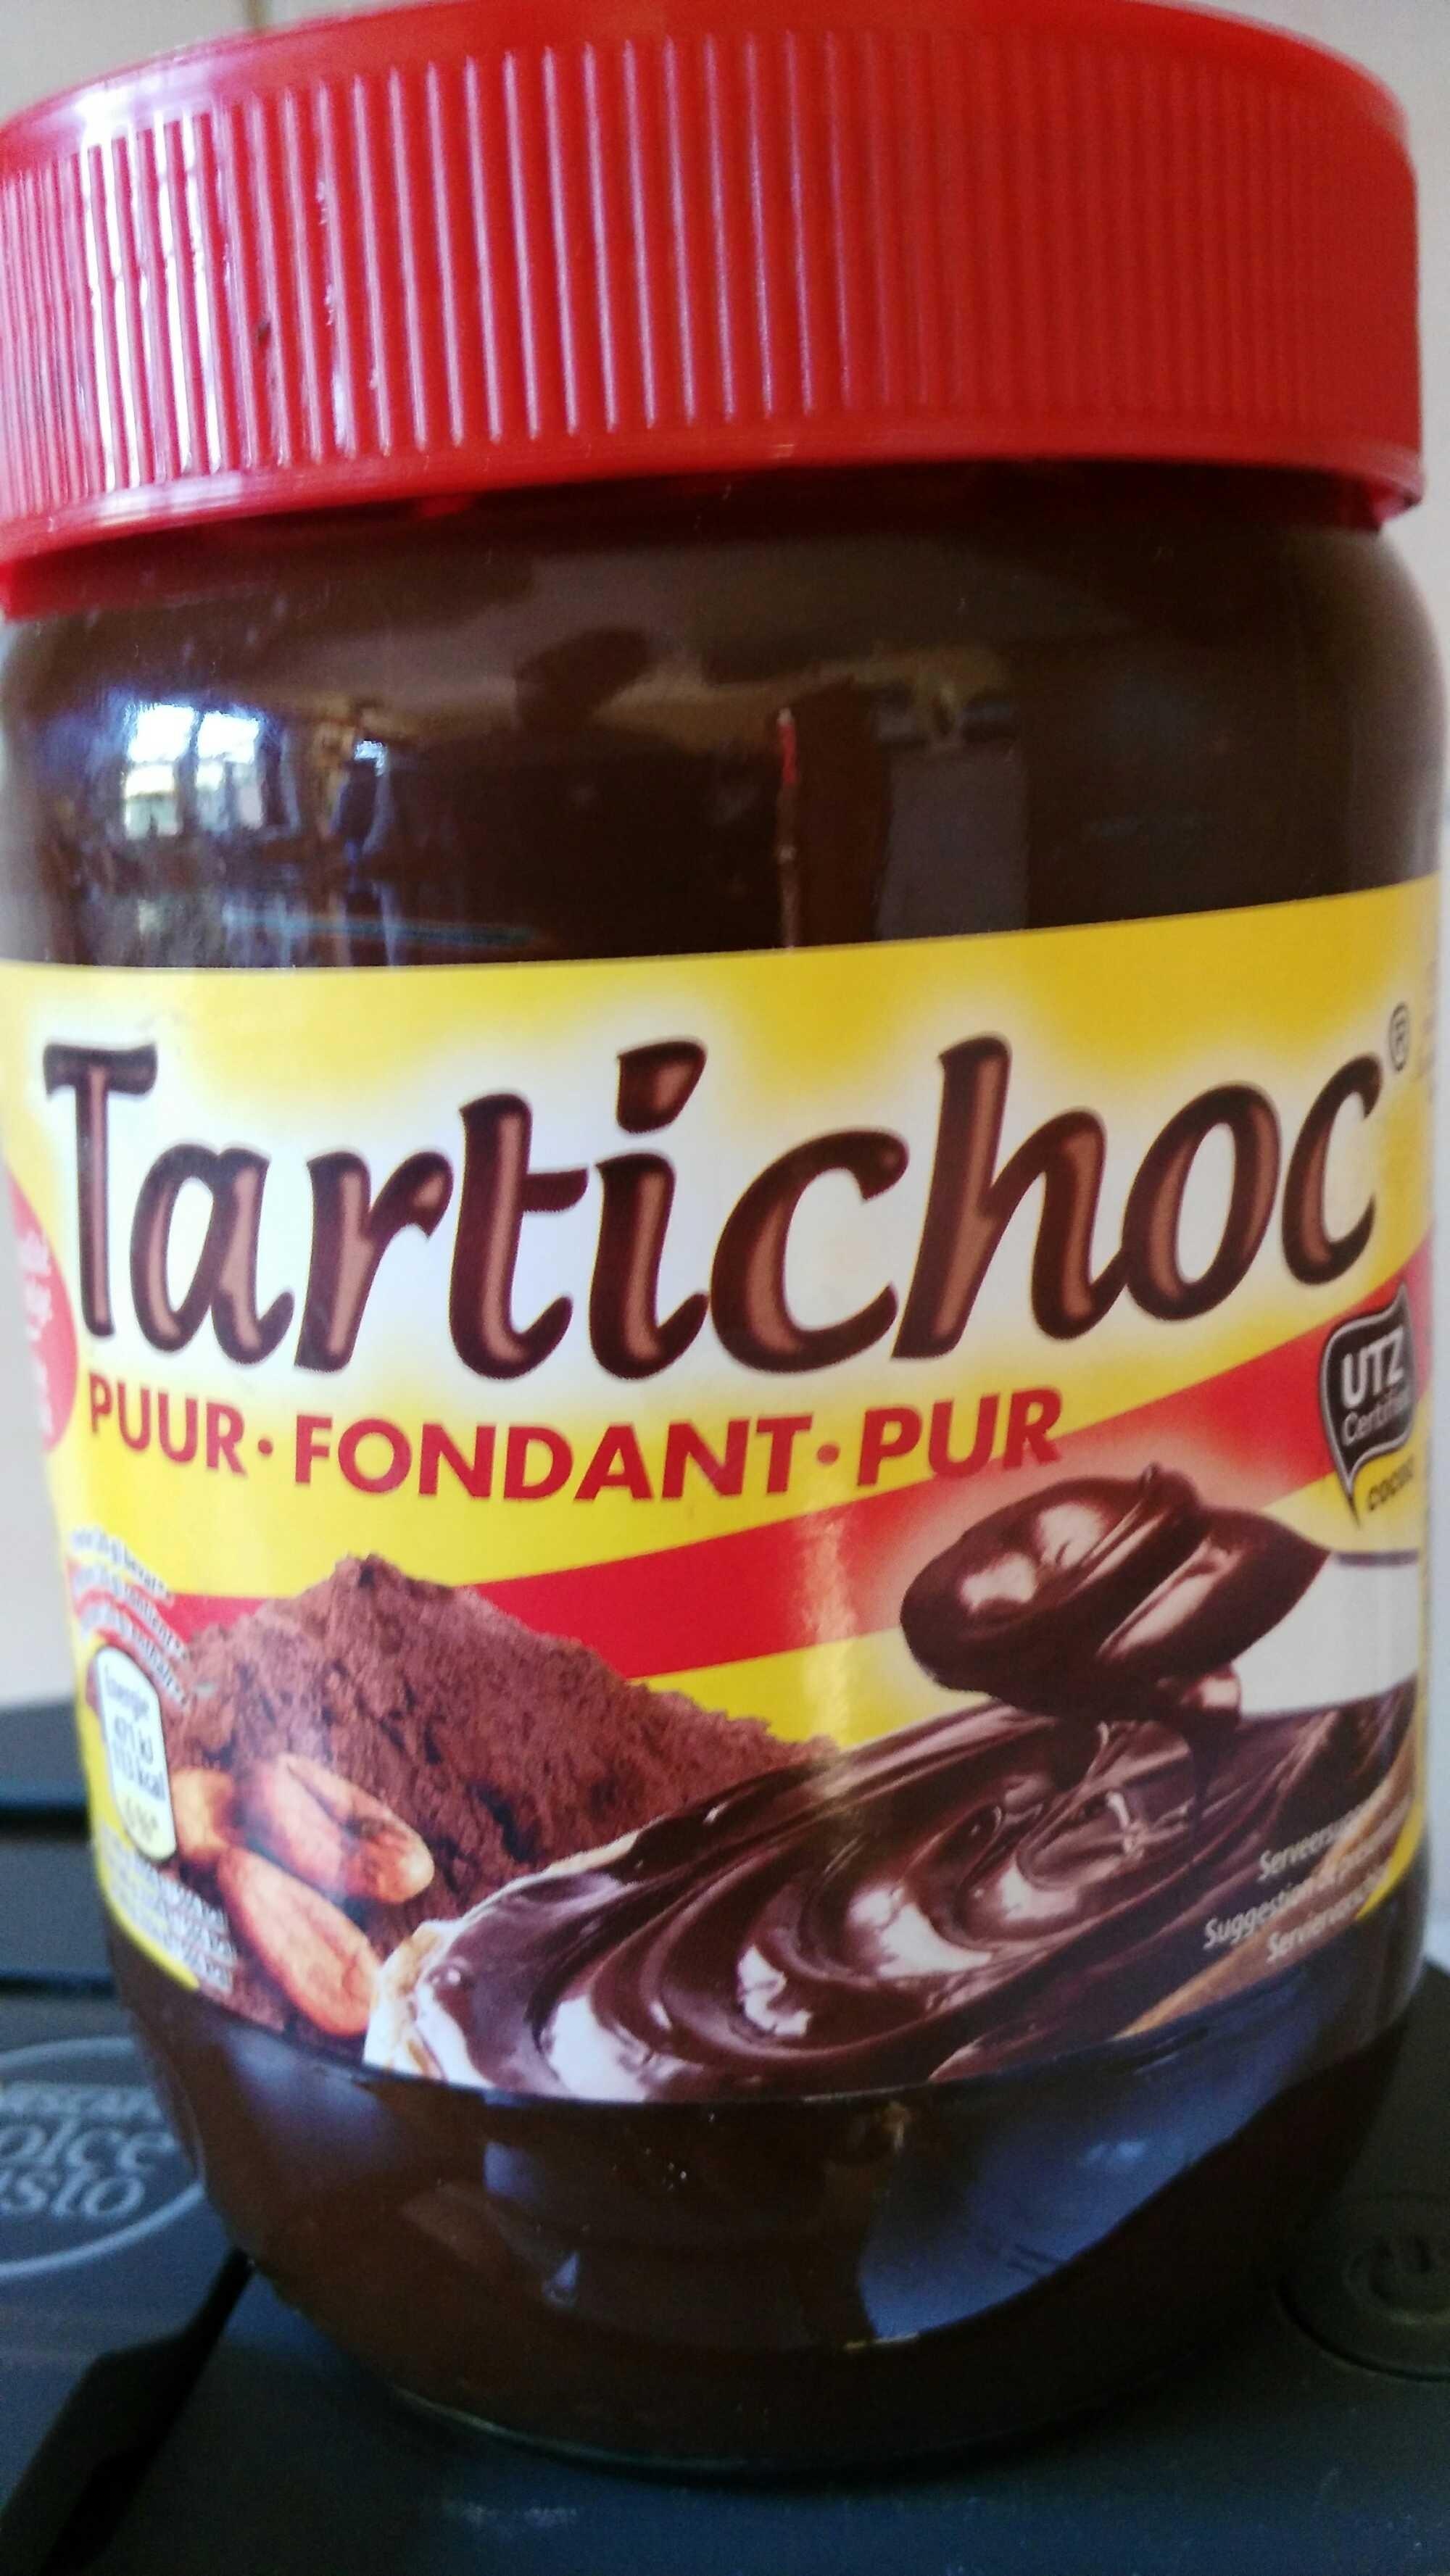 Tartichoc - Product - fr